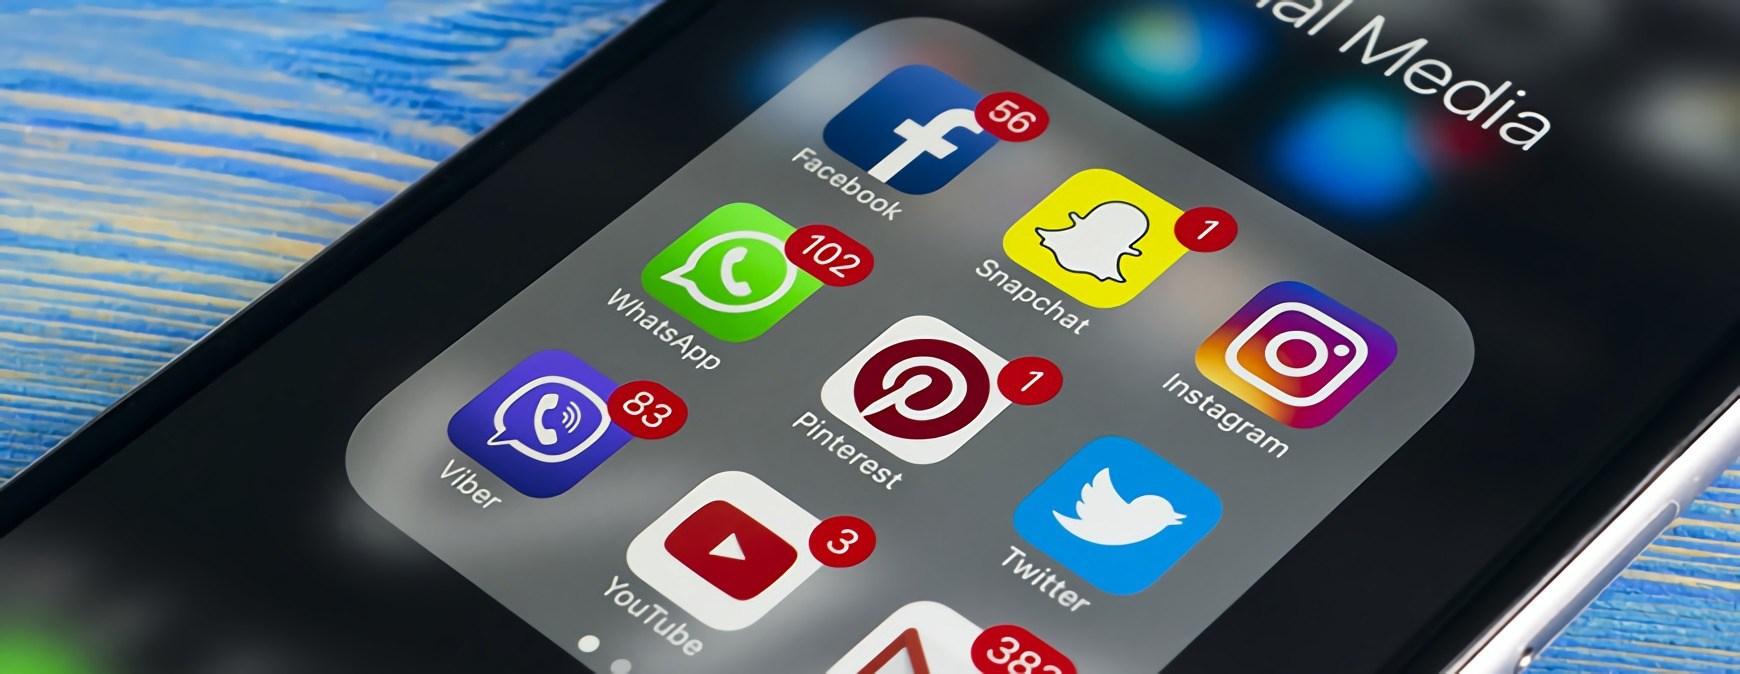 social media tips for job seekers